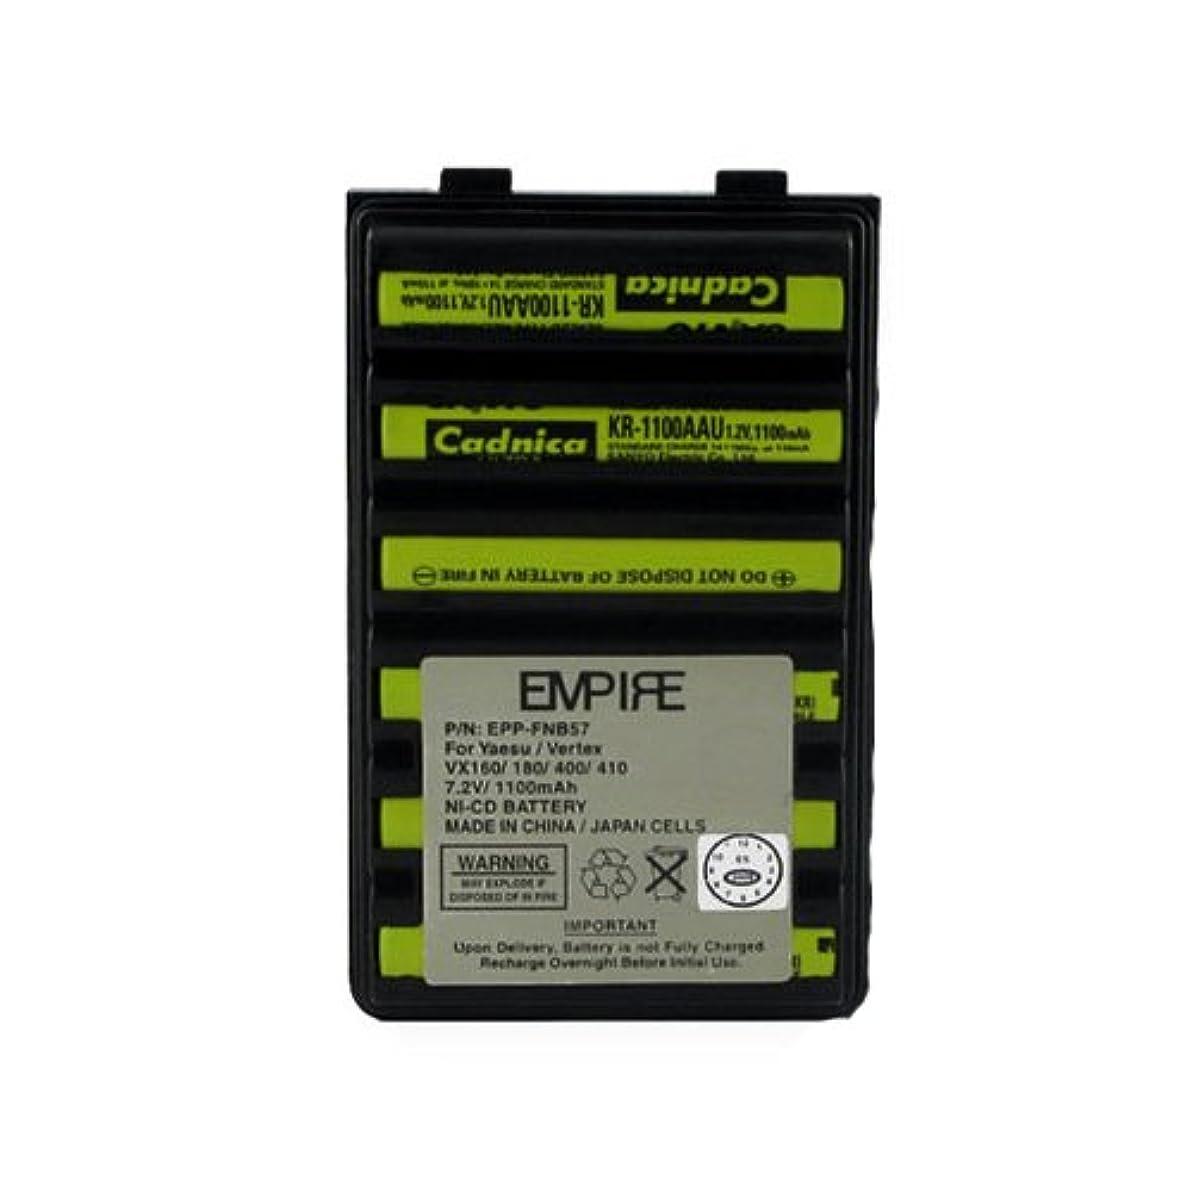 Vertex VX-400 2-Way Radio Battery (Ni-CD 7.2V 1000mAh) Rechargeable Battery - Replacement for Yaesu/Vertex FNB-V57 Battery